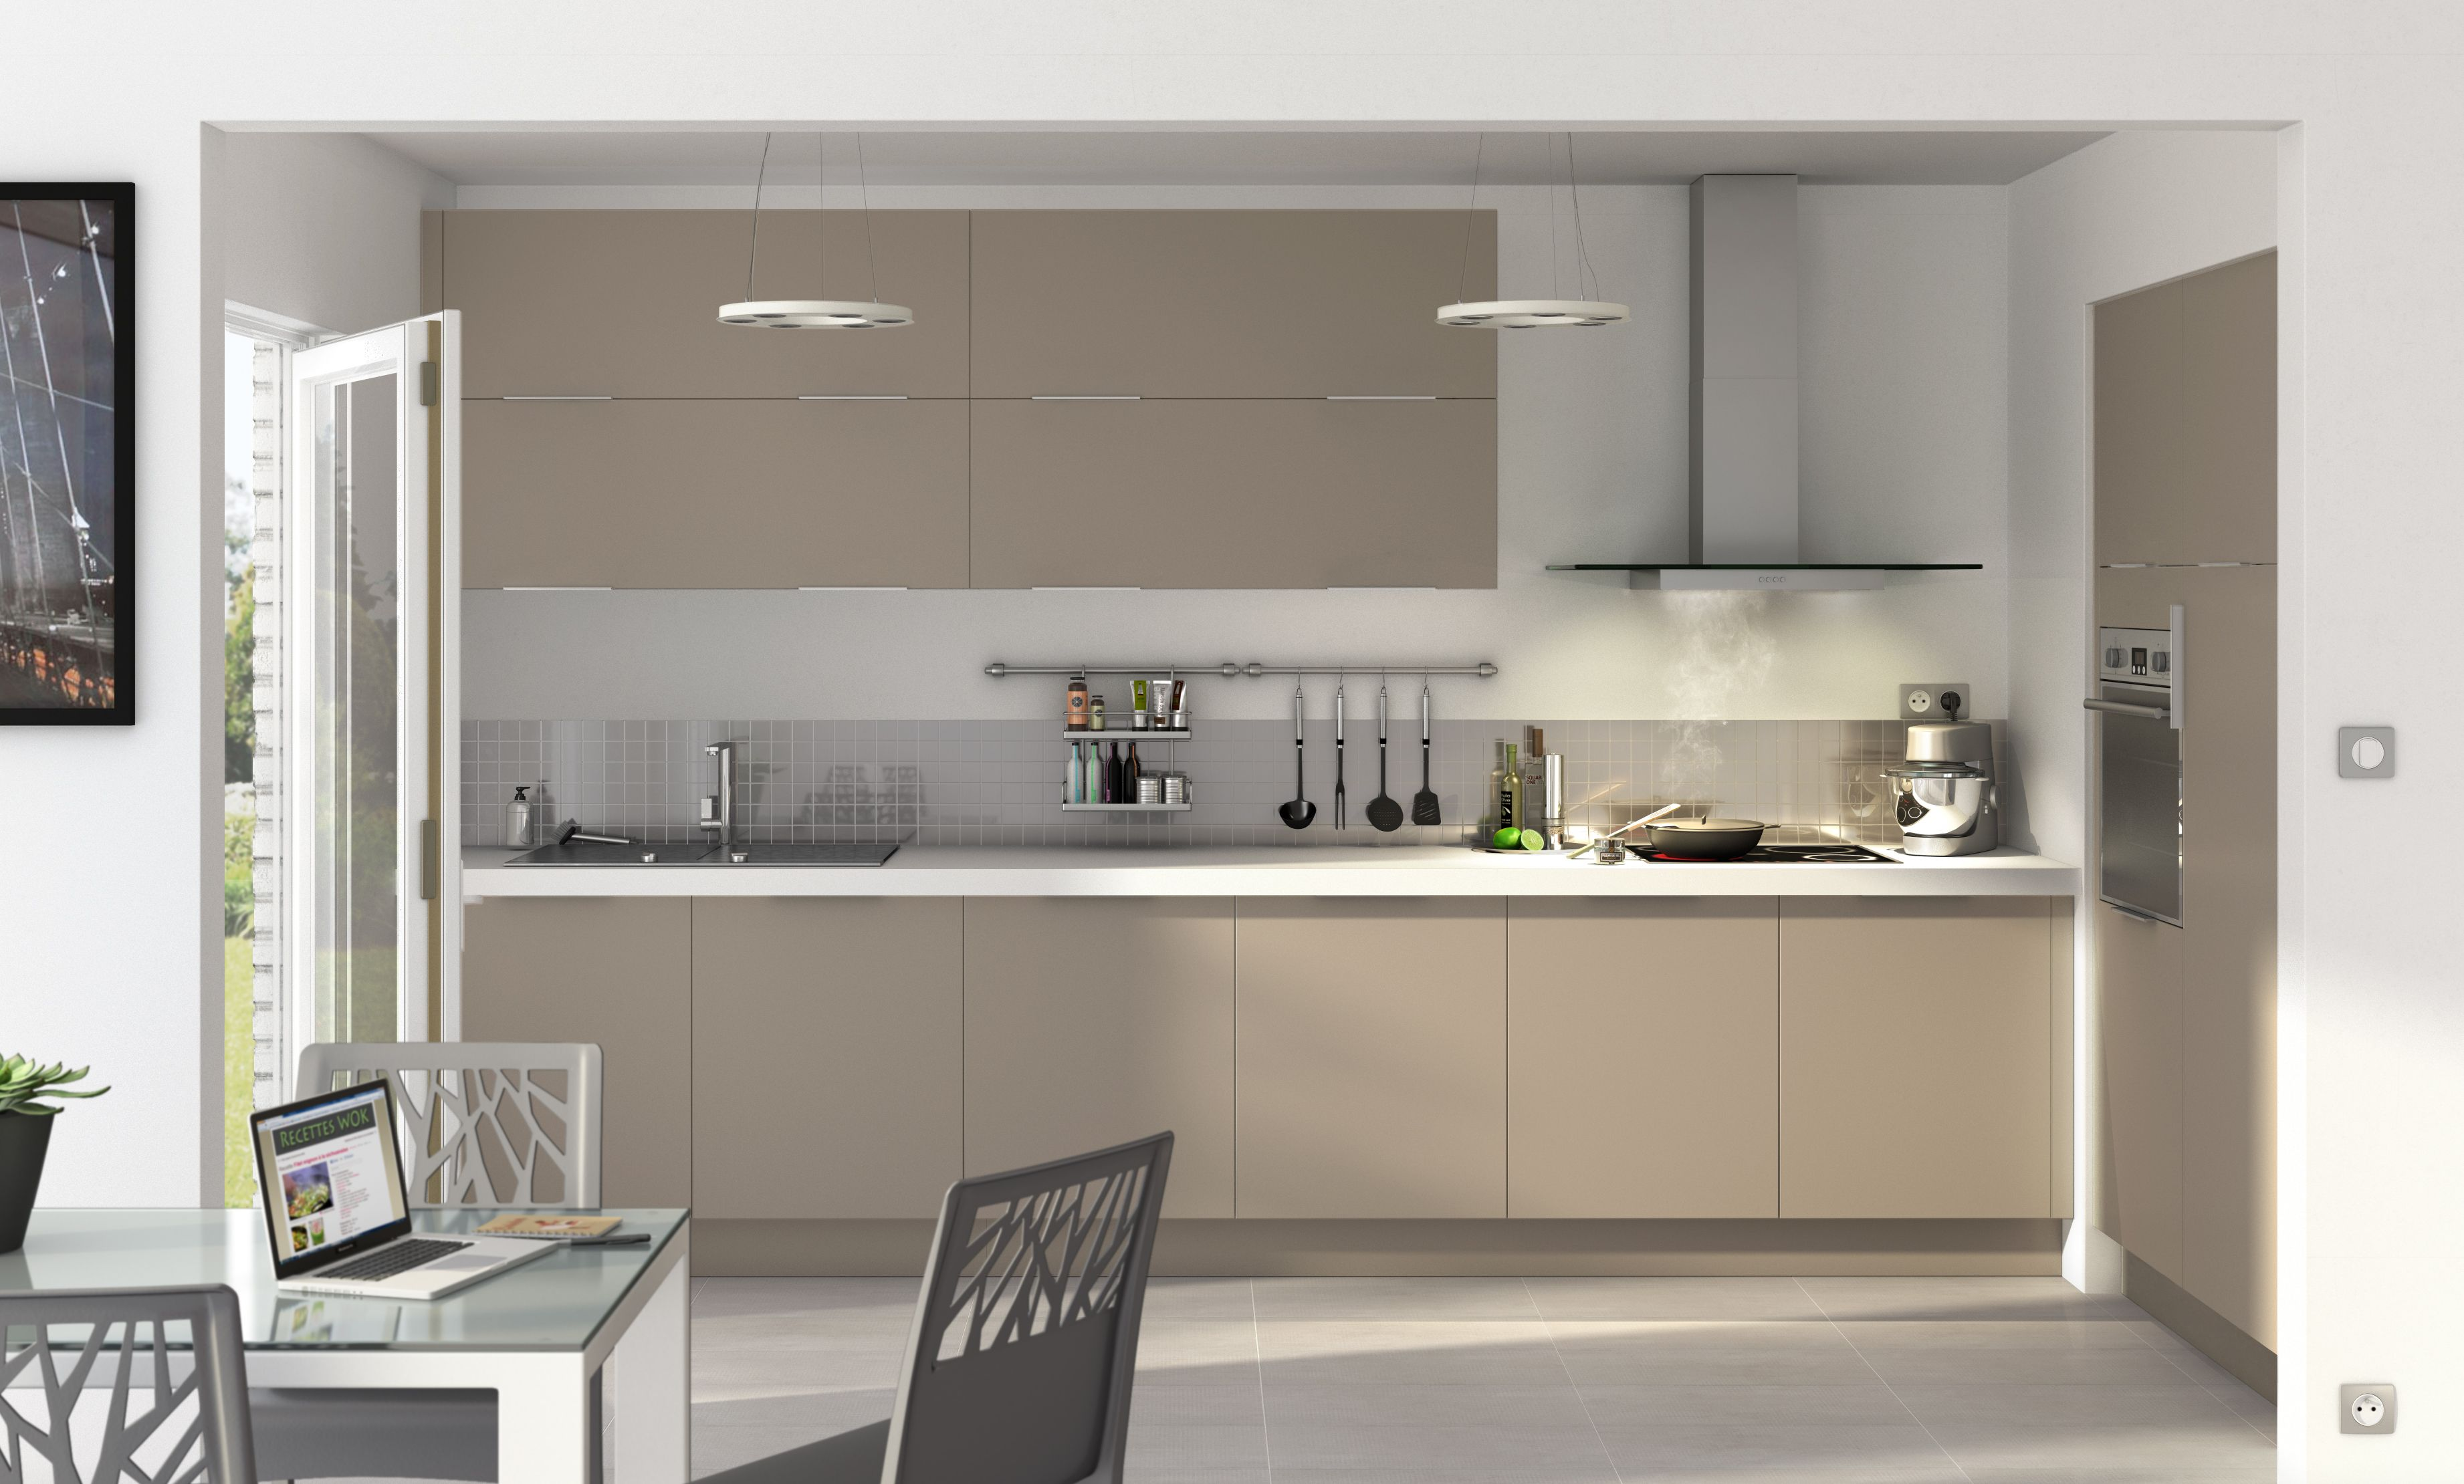 cuisine cooke lewis ice taupe dream home pinterest taupe meuble de cuisine et cuisines. Black Bedroom Furniture Sets. Home Design Ideas